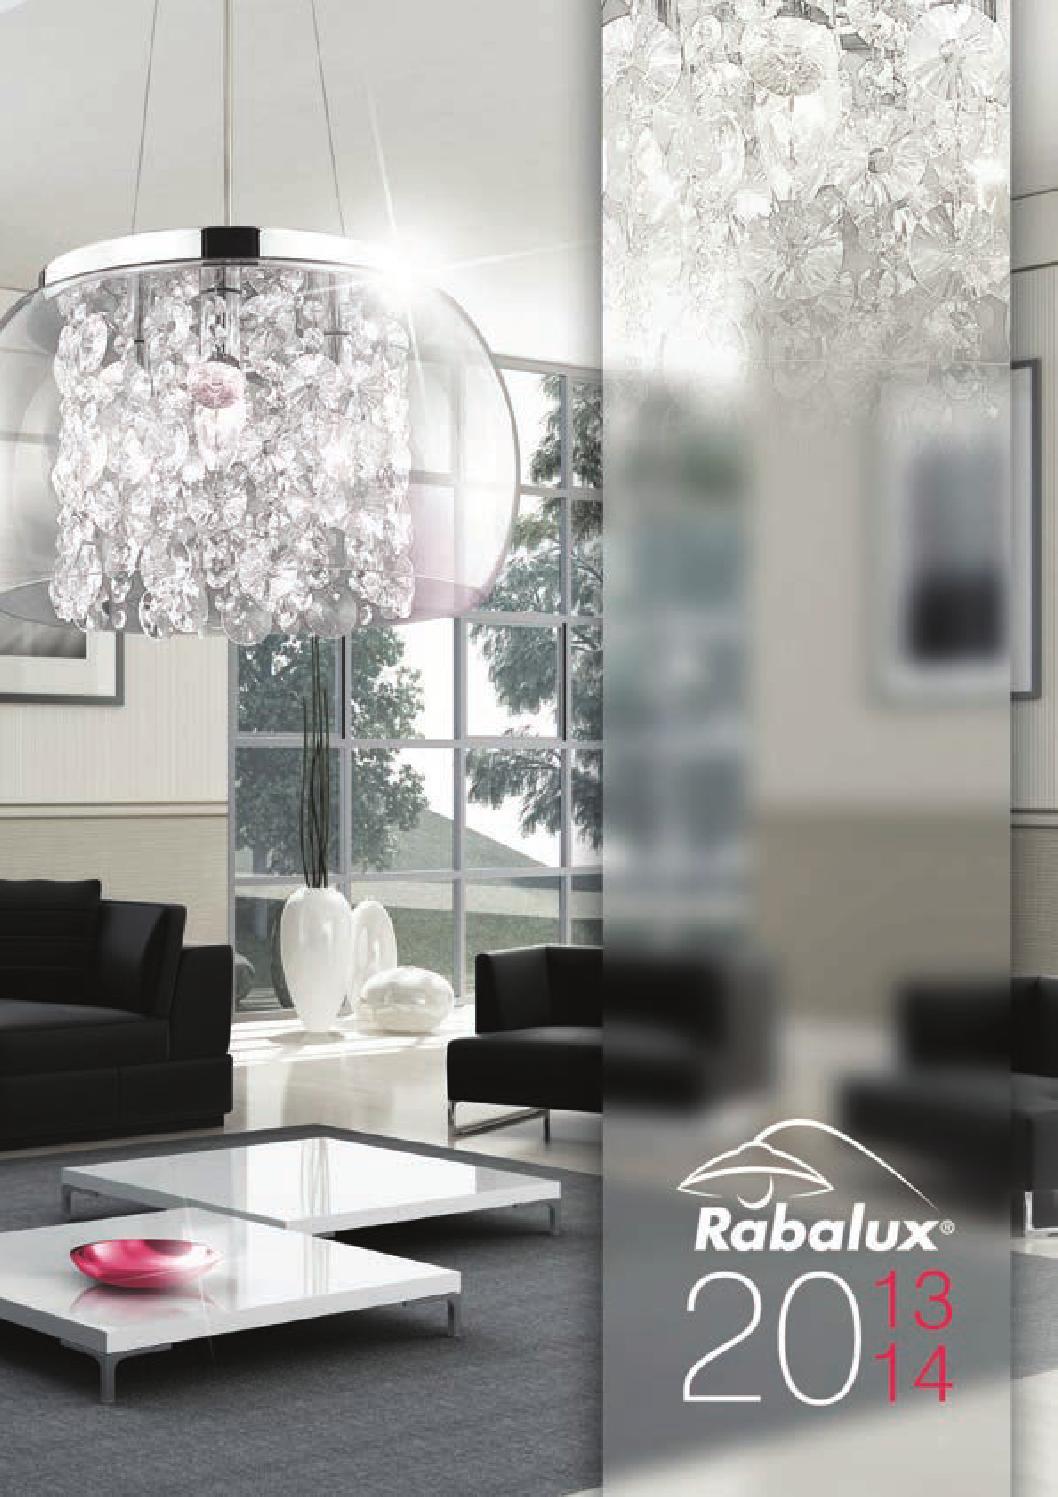 Rabalux Katalog 20132014 By Grading Doo Issuu